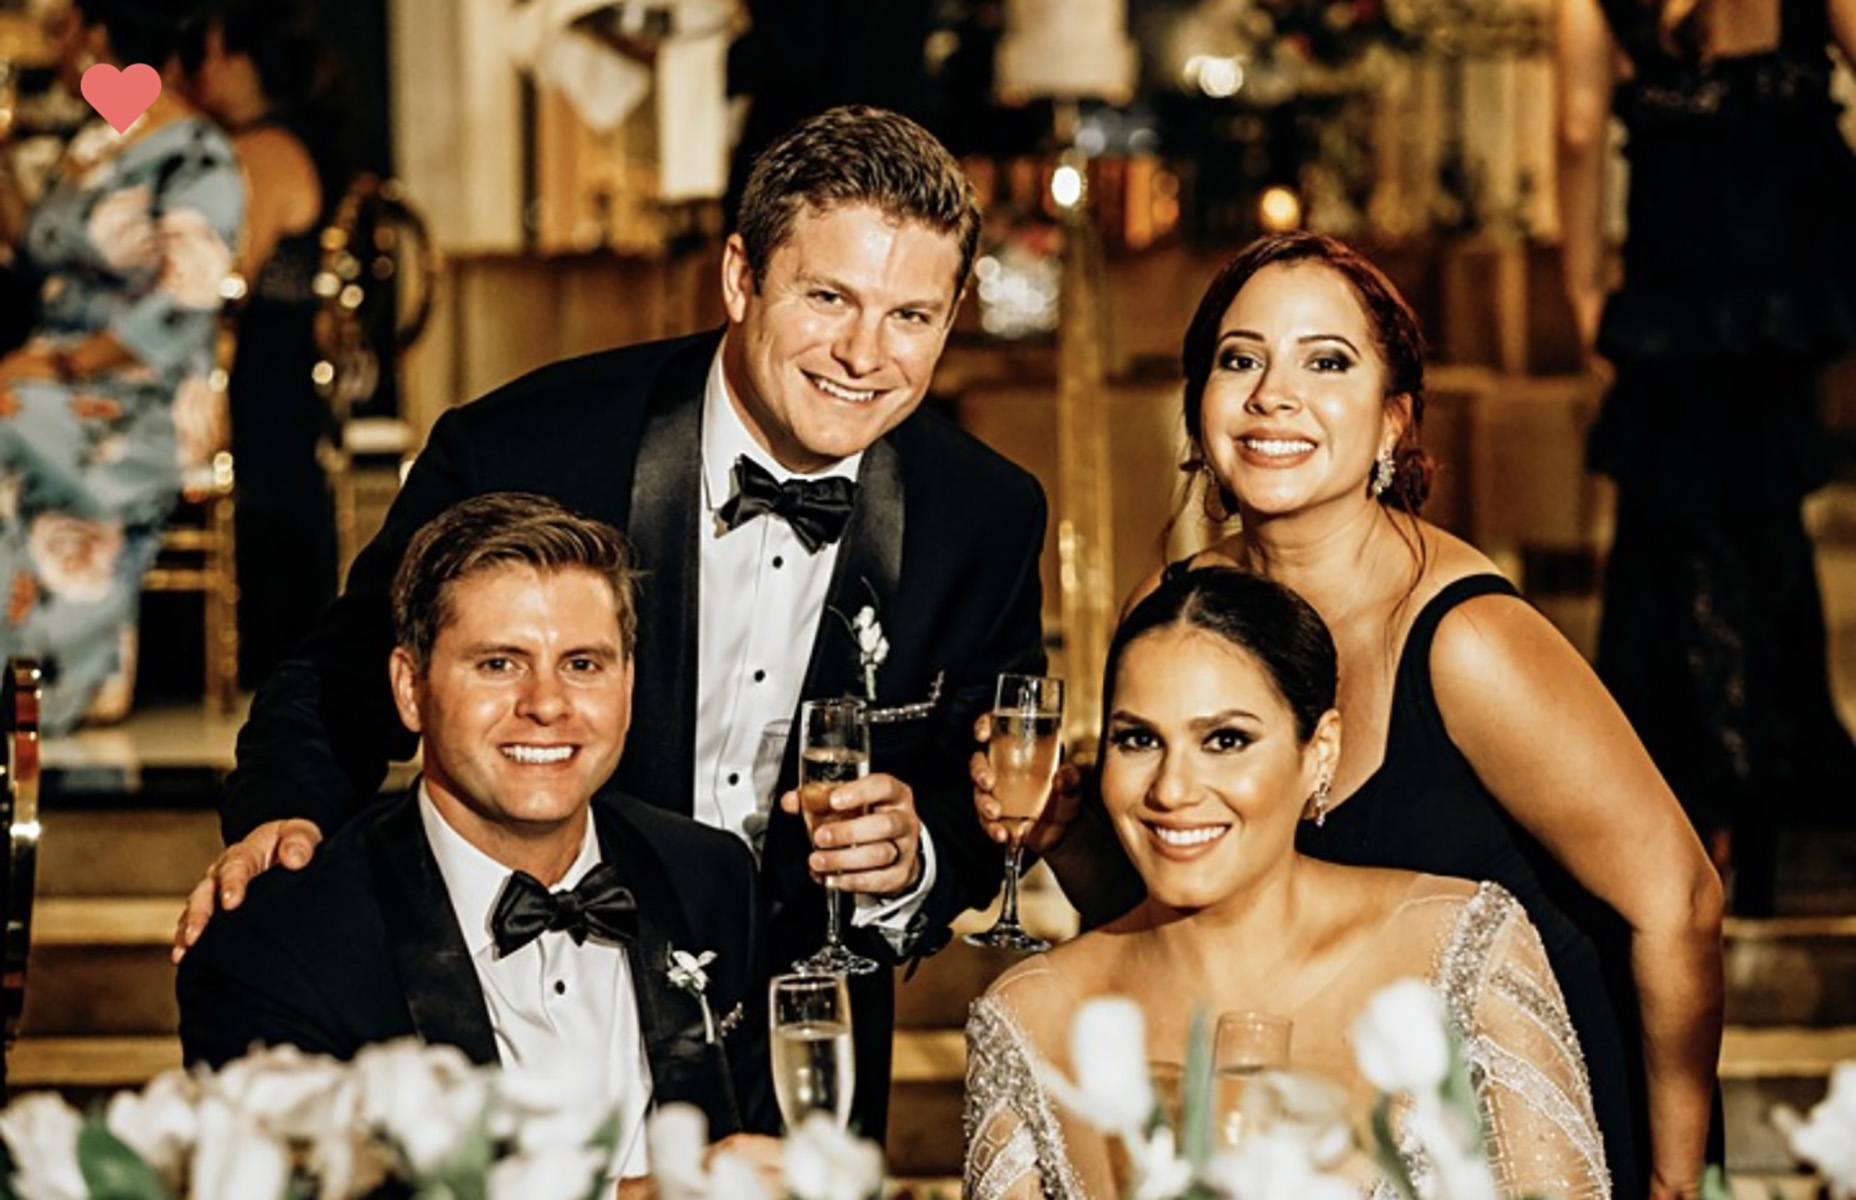 La pareja e invitados.Fotografía Esteban Daniel Photography